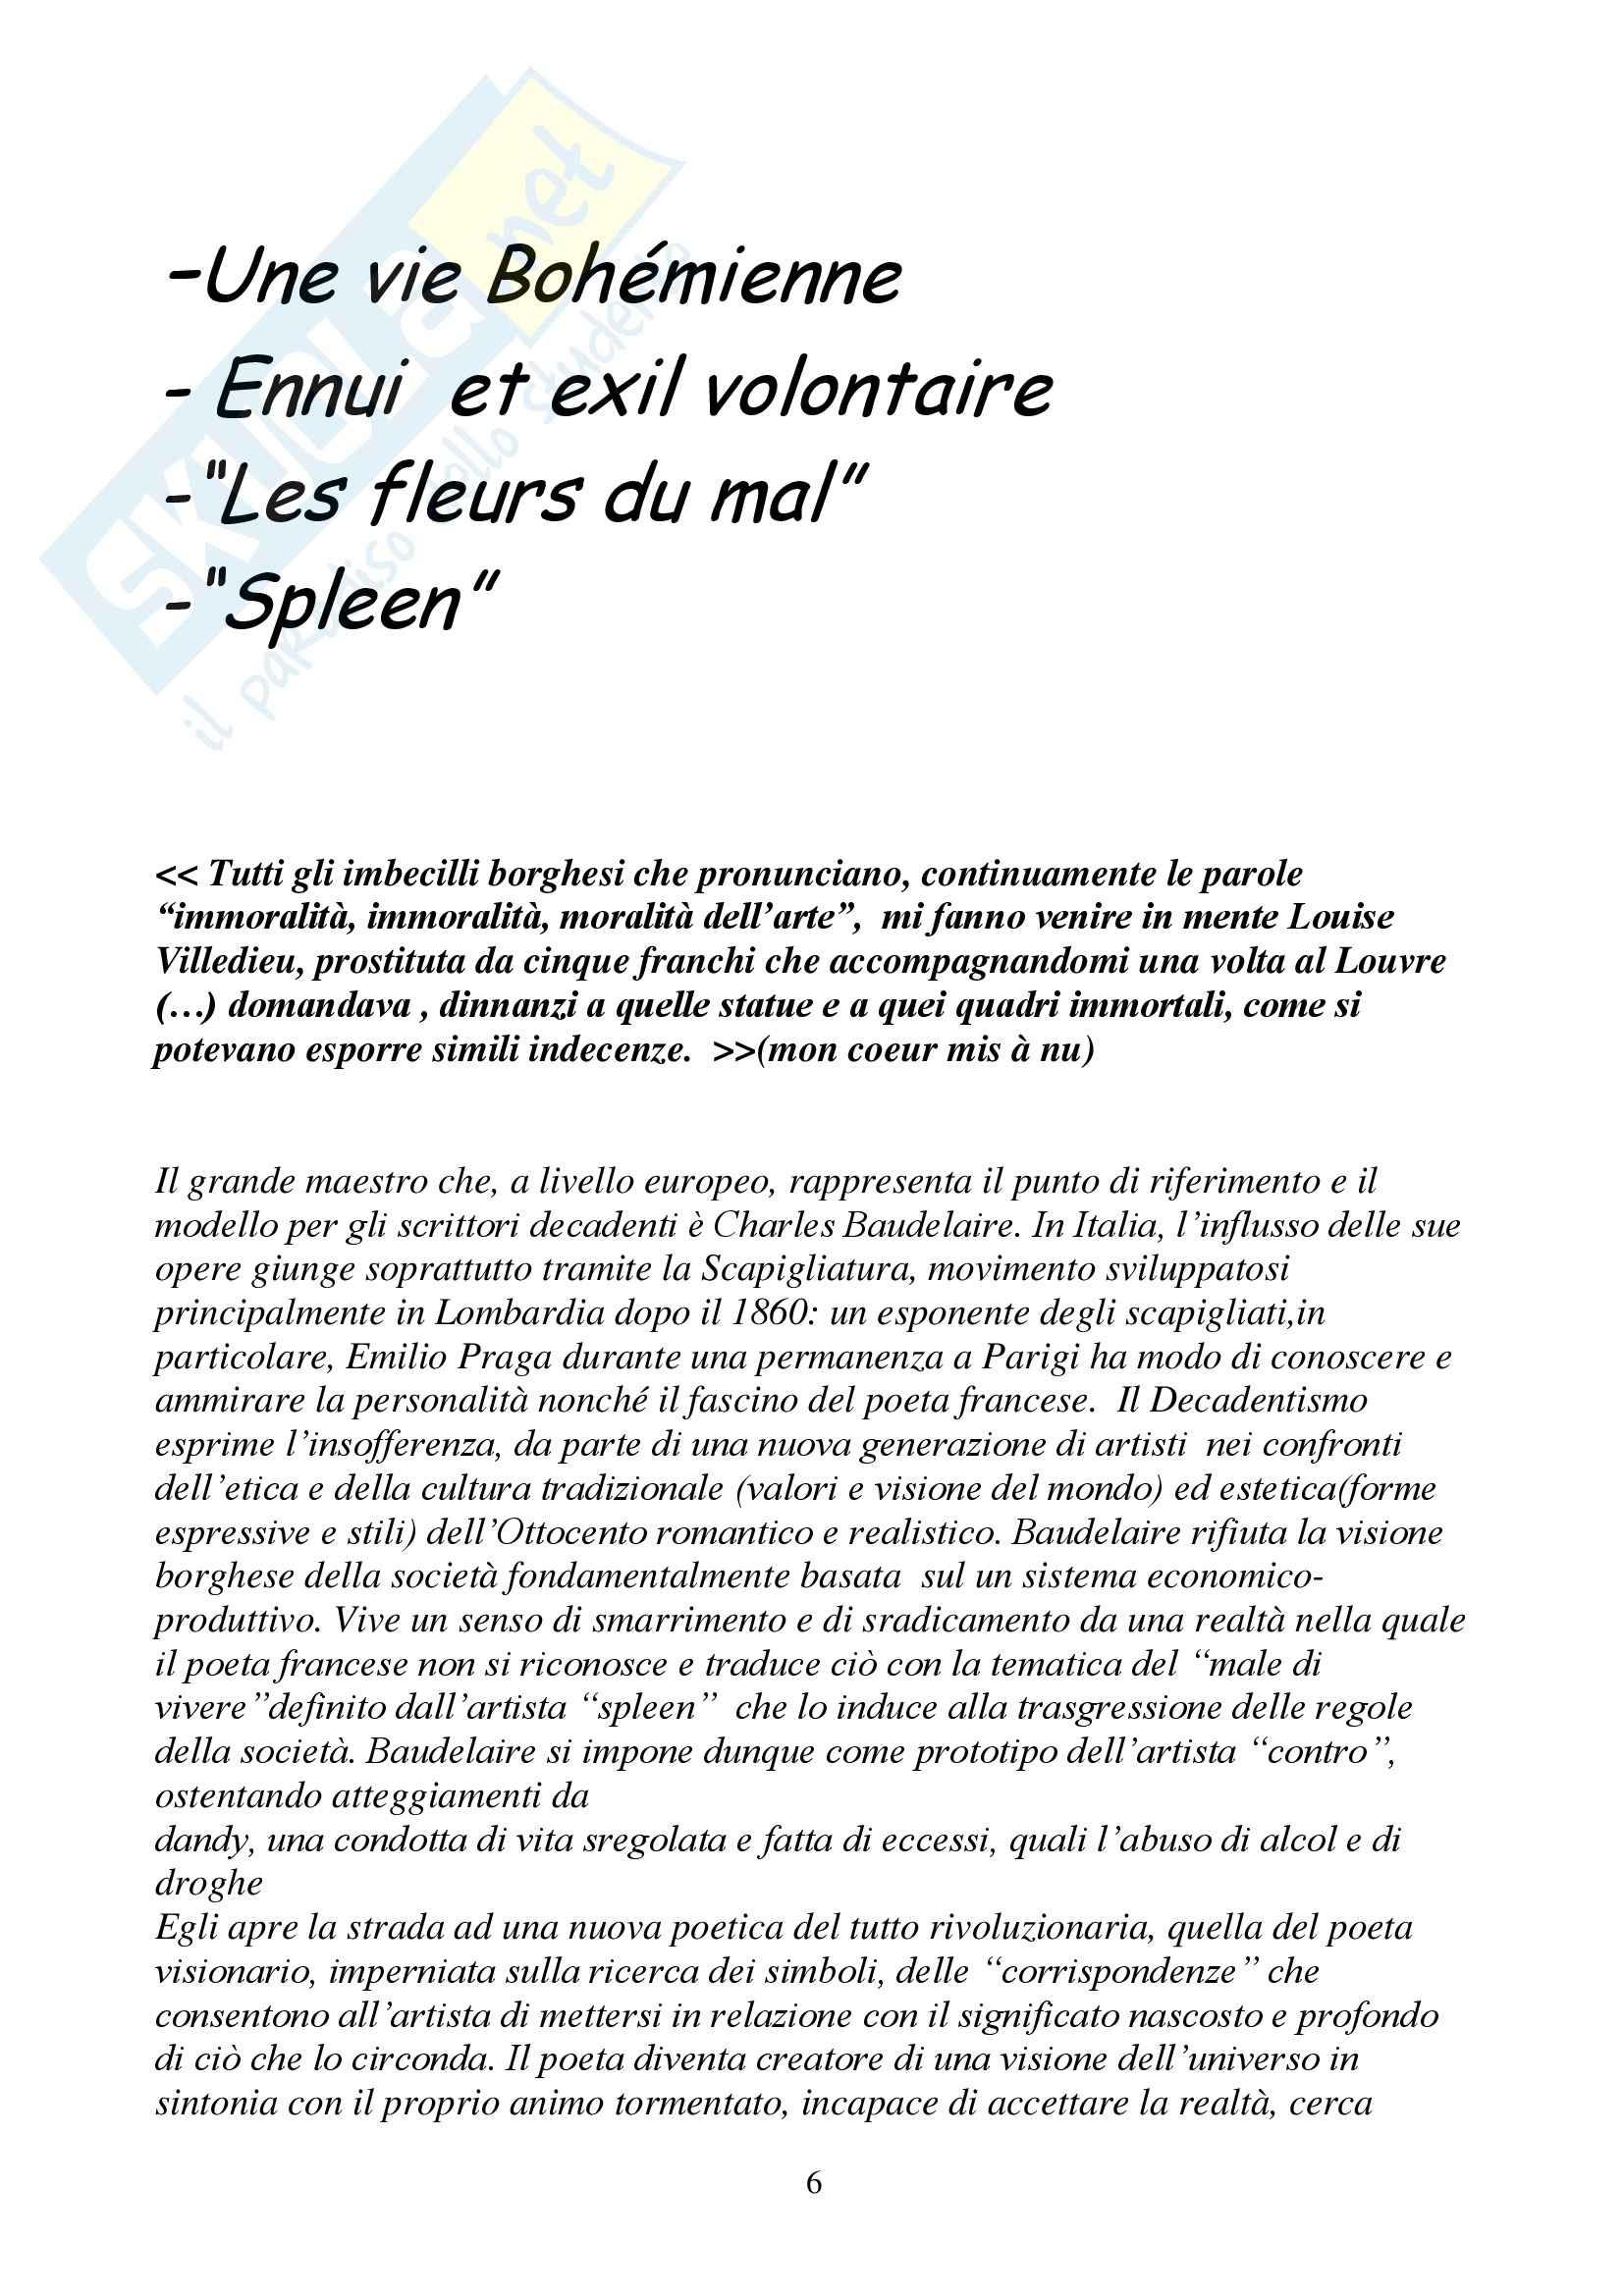 Politica sociale - anticonformismo e disagio sociale Pag. 6